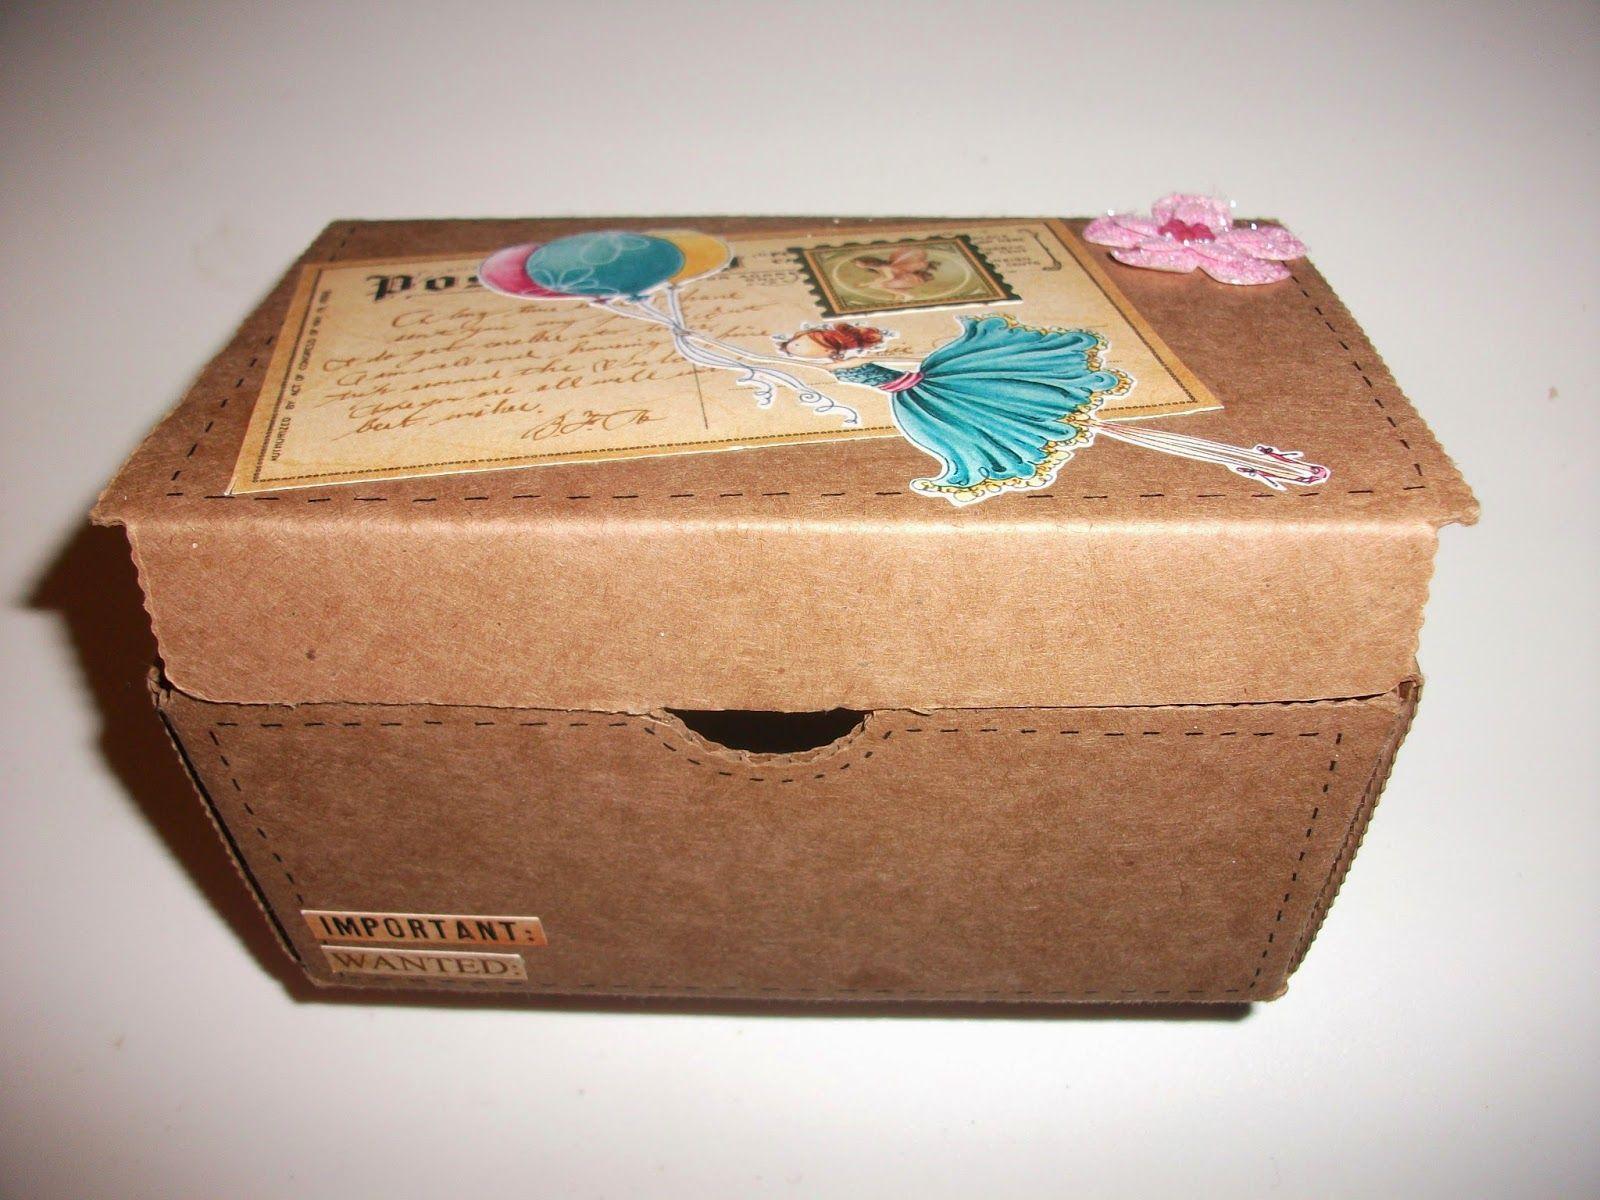 Fabrica Tu Mundo De Manualidades Caja De Carton Decorada I Caja De Carton Cajas Cajas Decoradas De Carton